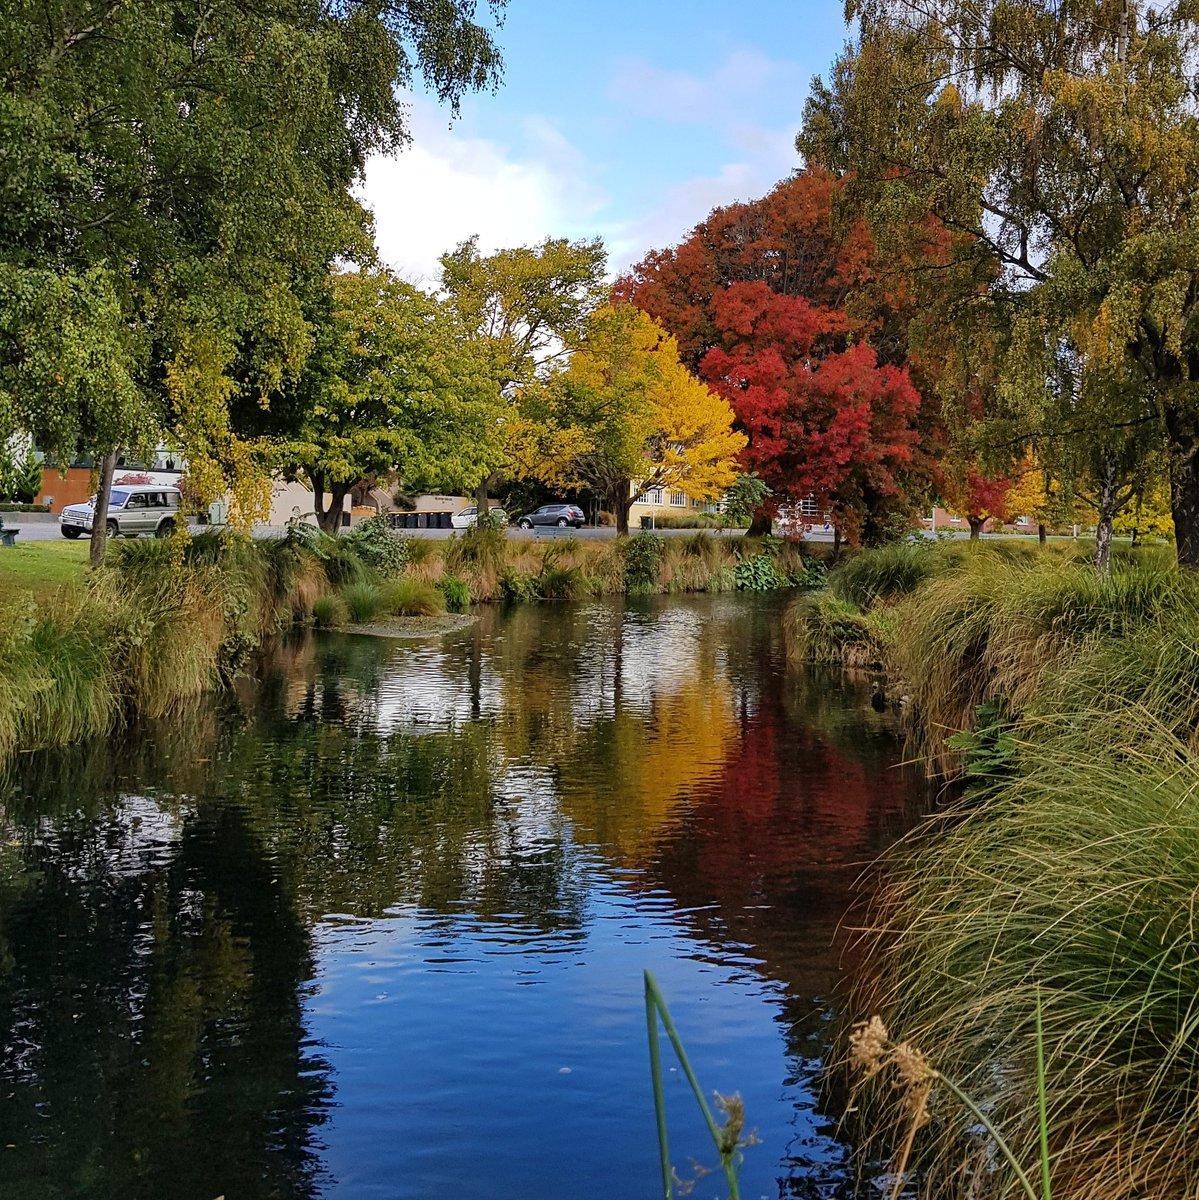 Colours in Christchurch #christchurch  #NewZealand<br>http://pic.twitter.com/7gUVIoqHXL